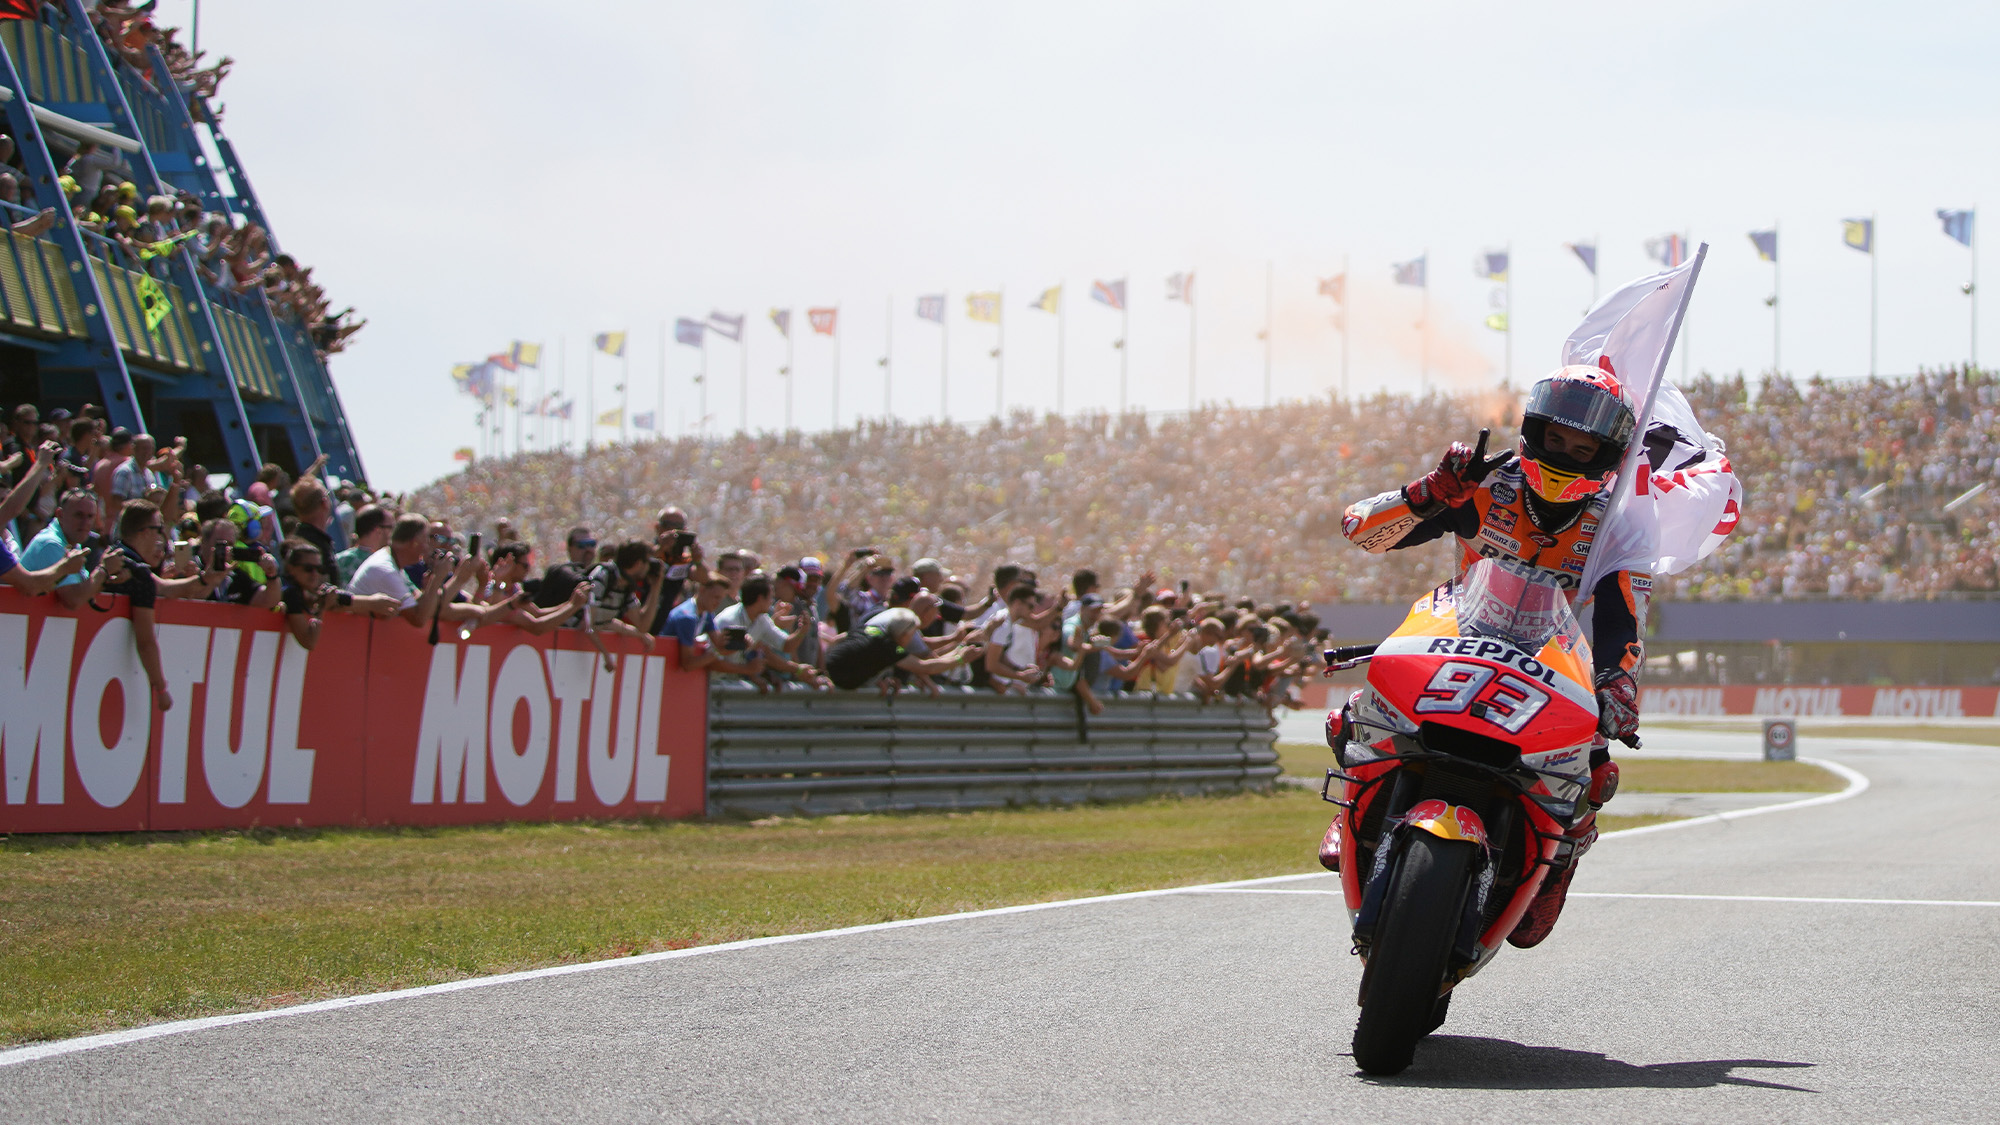 Marc Marquez celebrates victory in the 2019 MotoGP Dutch TT at Assen